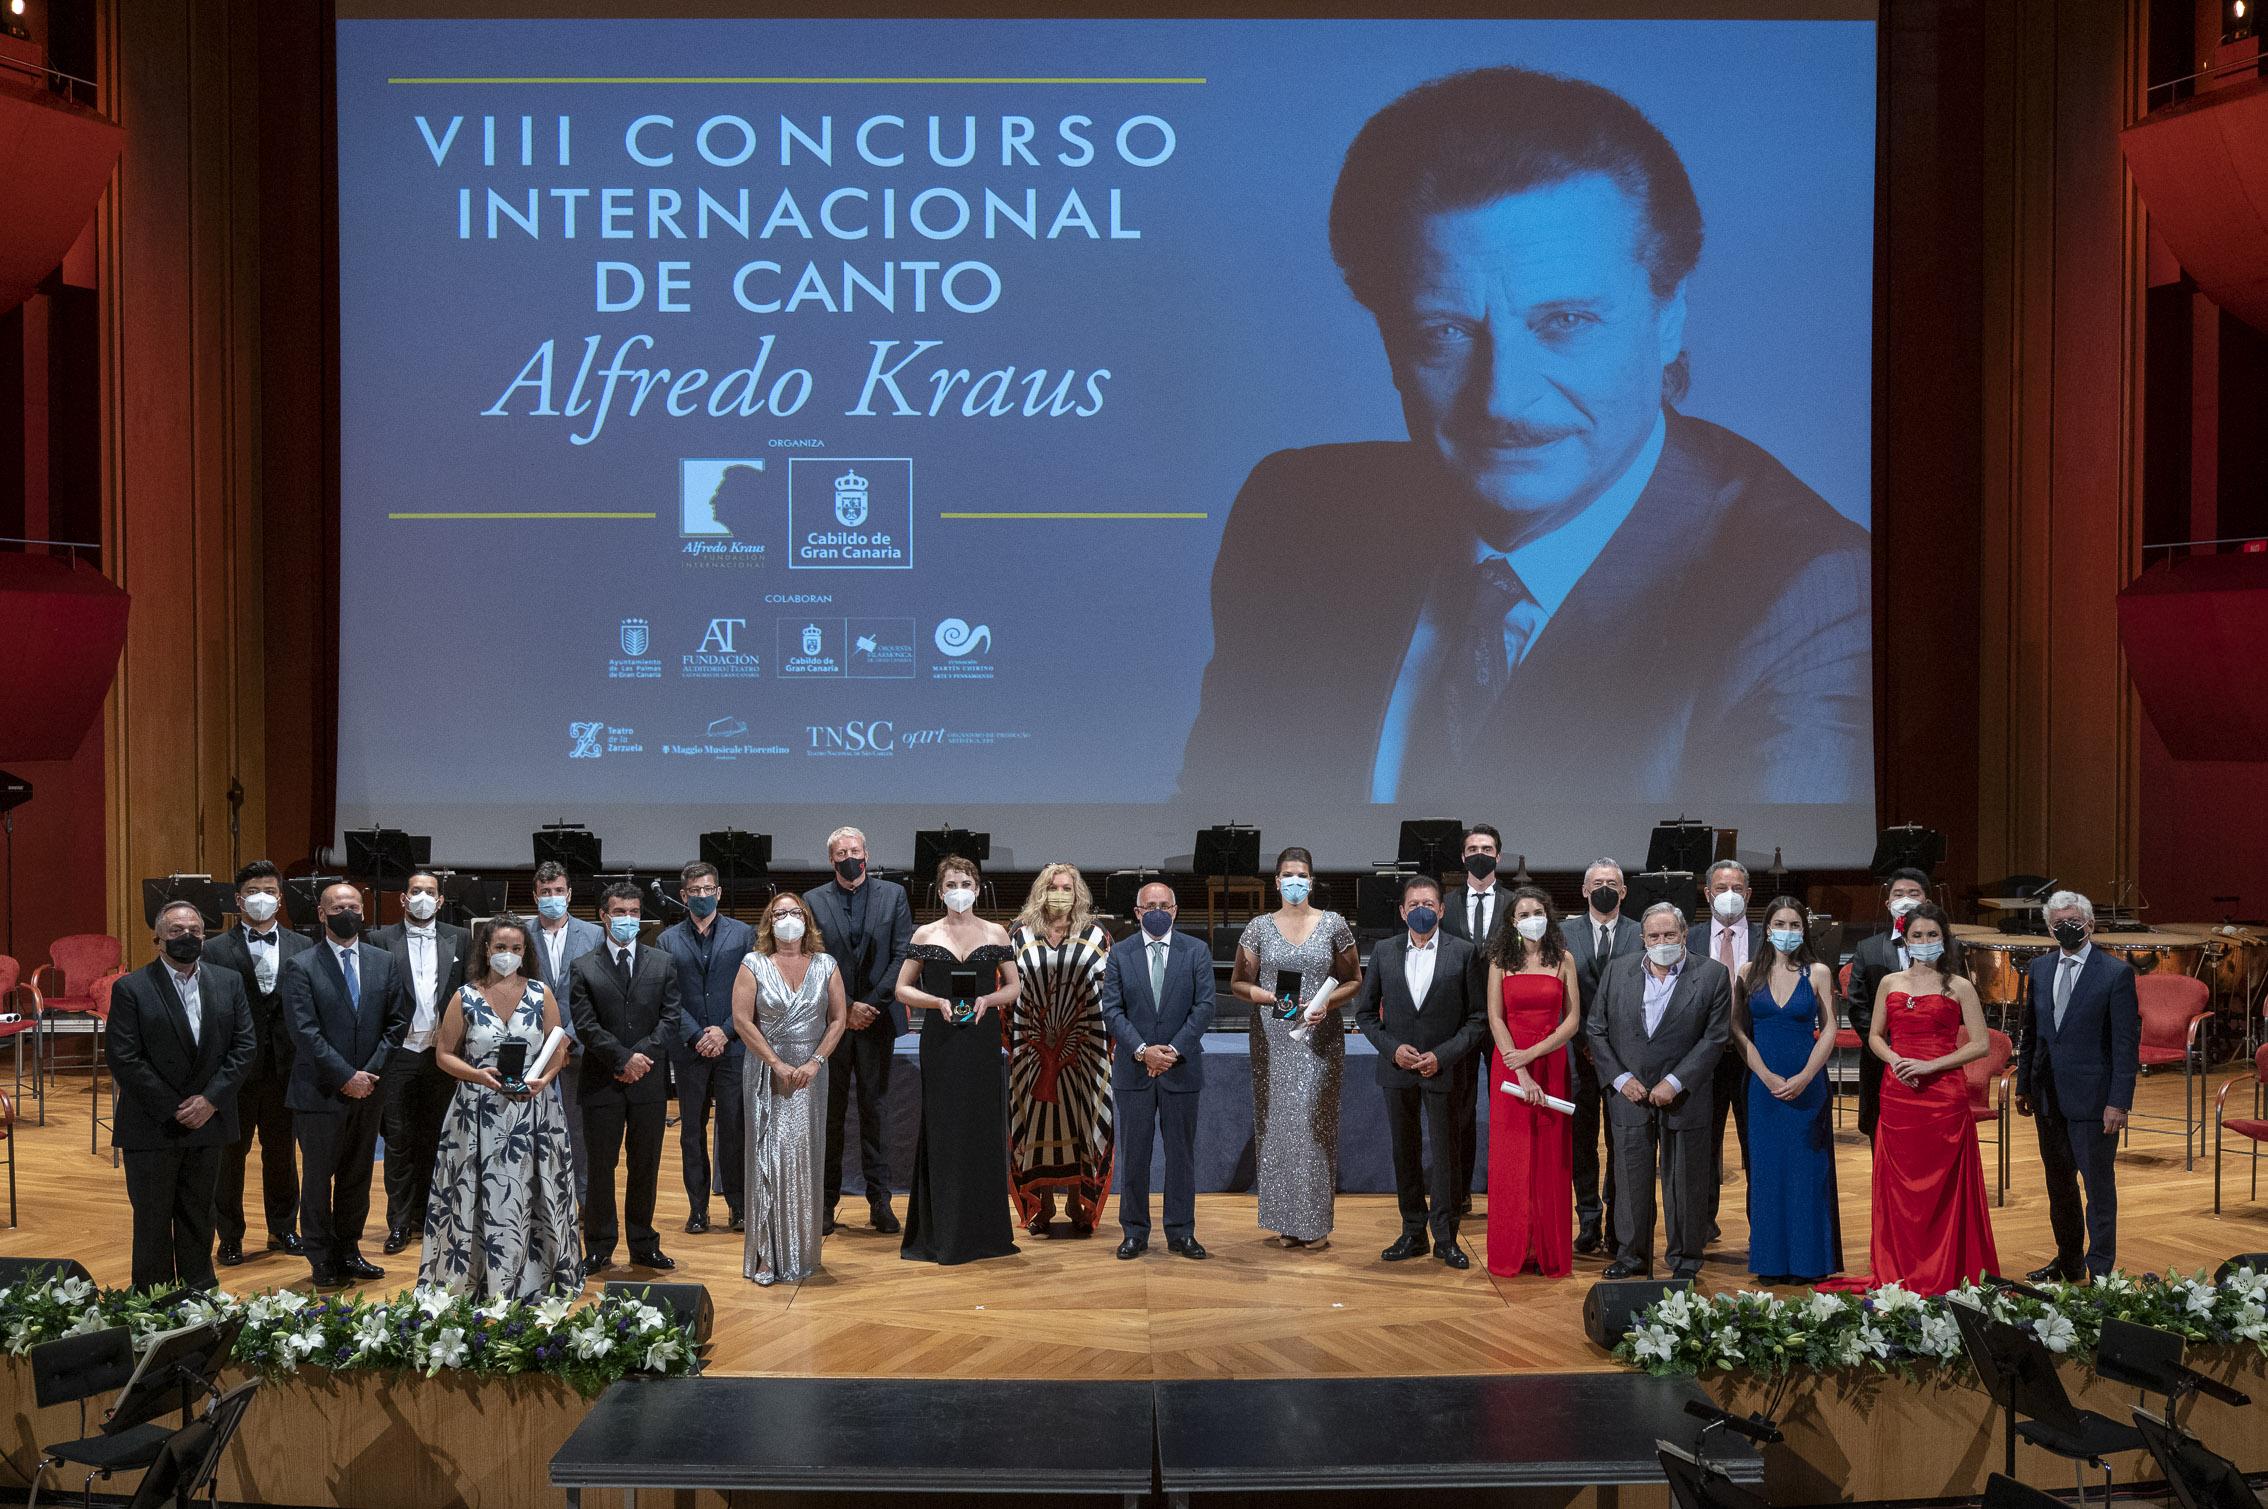 La mezzosoprano ucraniana Olga Syniakova obtiene el primer premio del VIII Concurso Internacional de Canto Alfredo Kraus